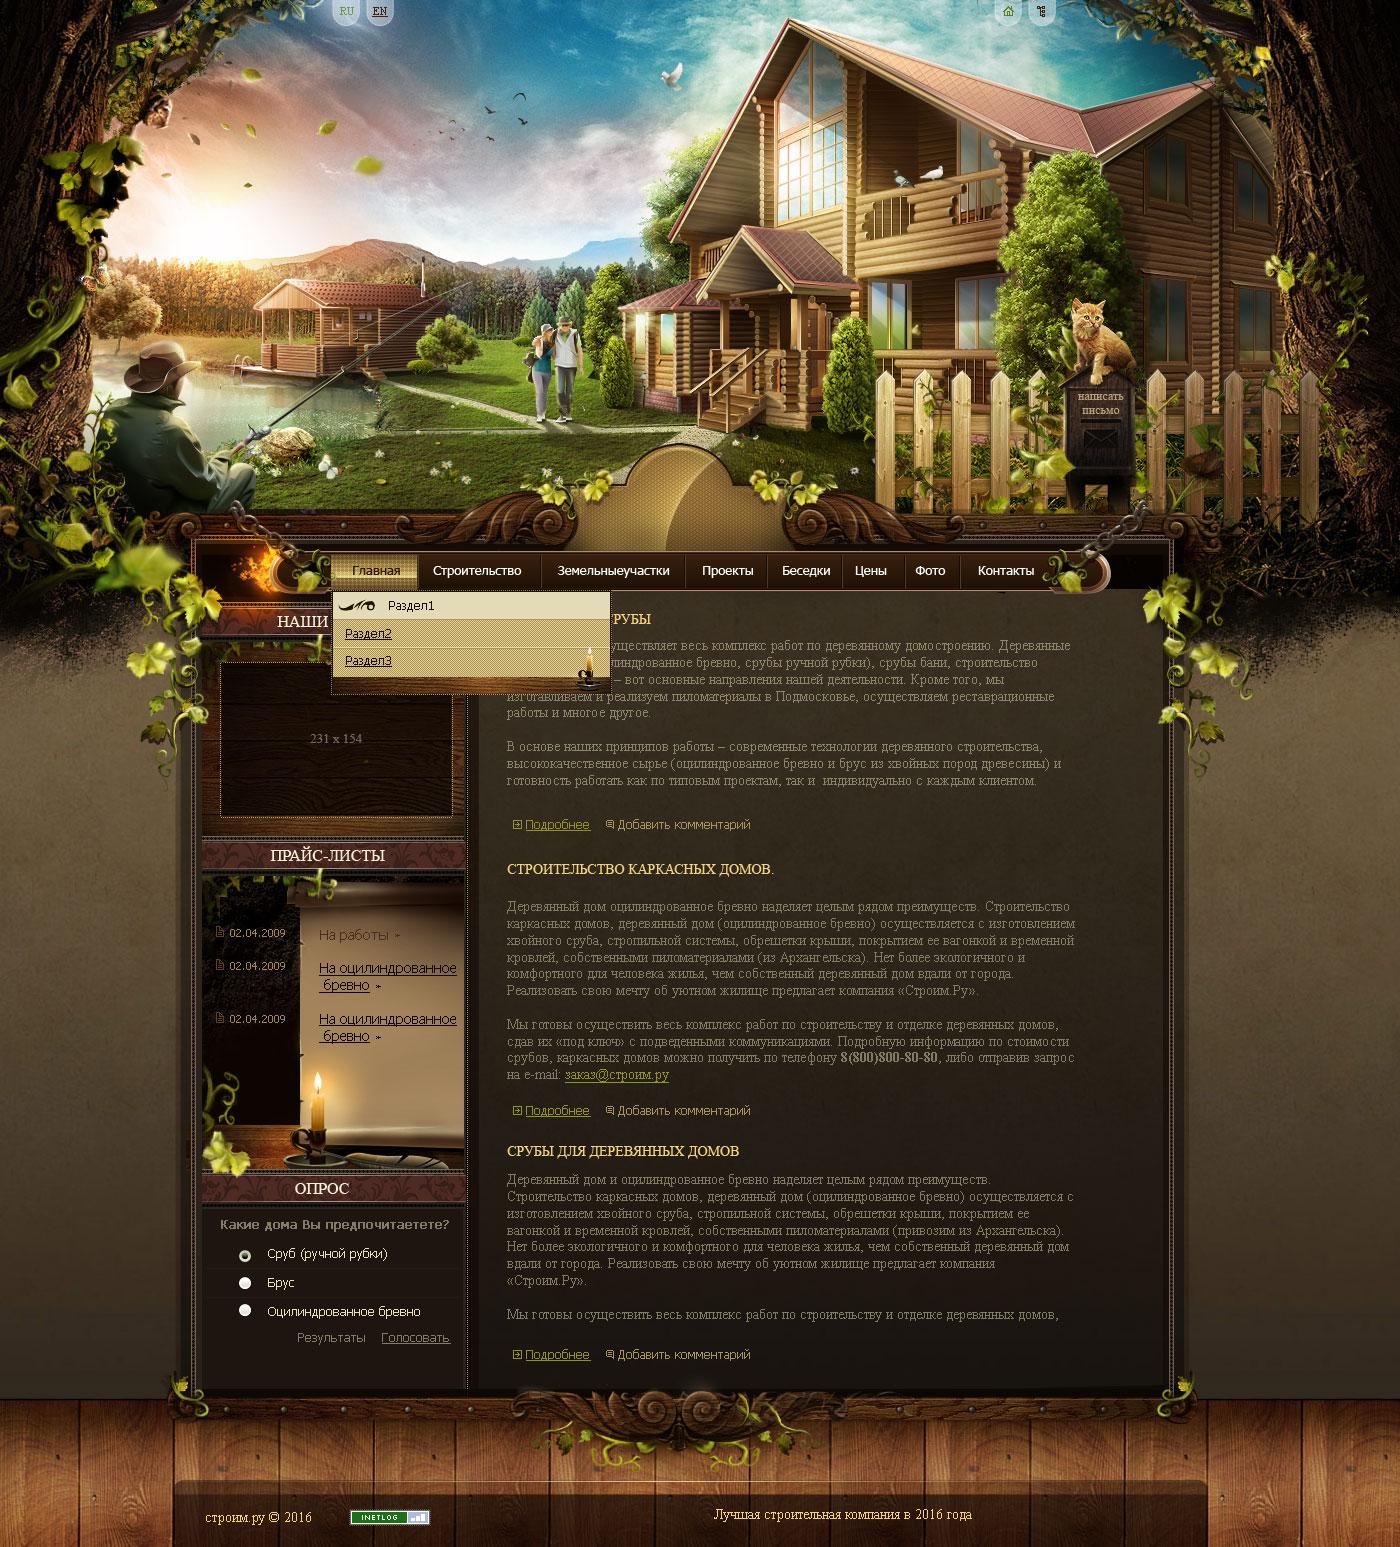 Шаблоны сайтов, готовый дизайн, бесплатные шаблоны